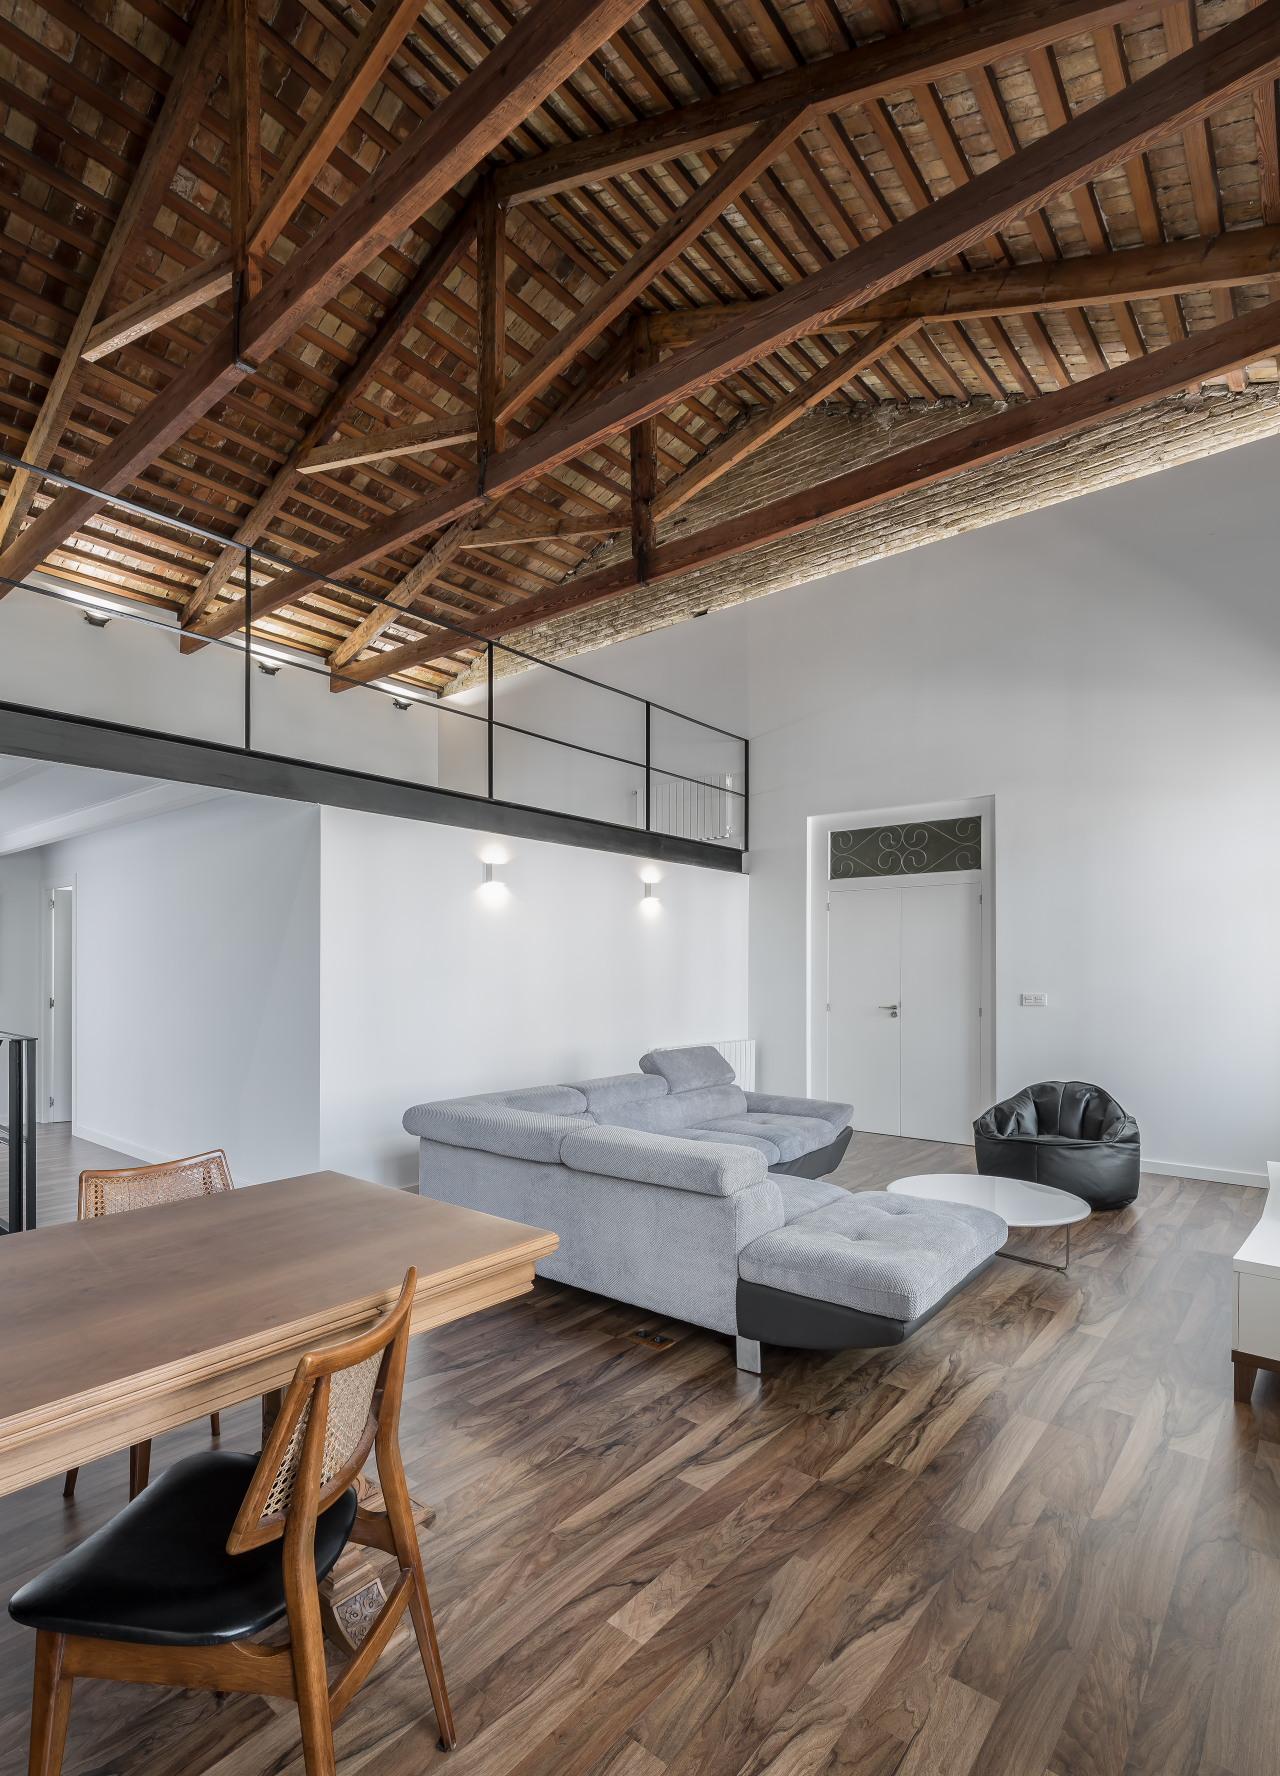 fotografia-arquitectura-valencia-german-cabo-viraje-rehabilitacion-campanar (35)